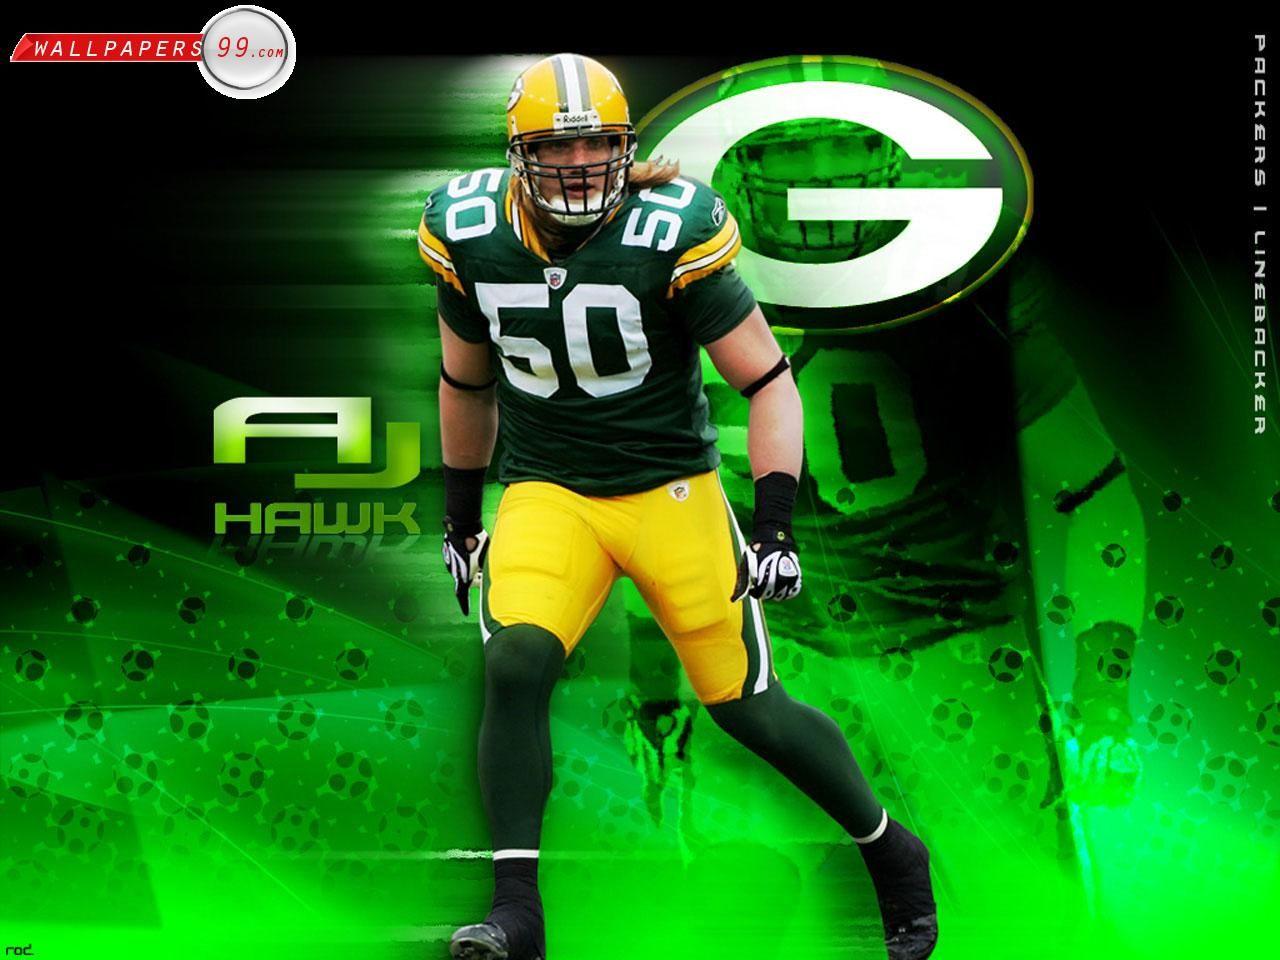 Green Bay Packers 24029 Jpg 1280 960 Green Bay Packers Clothing Green Bay Packers Crafts Packers Clothing